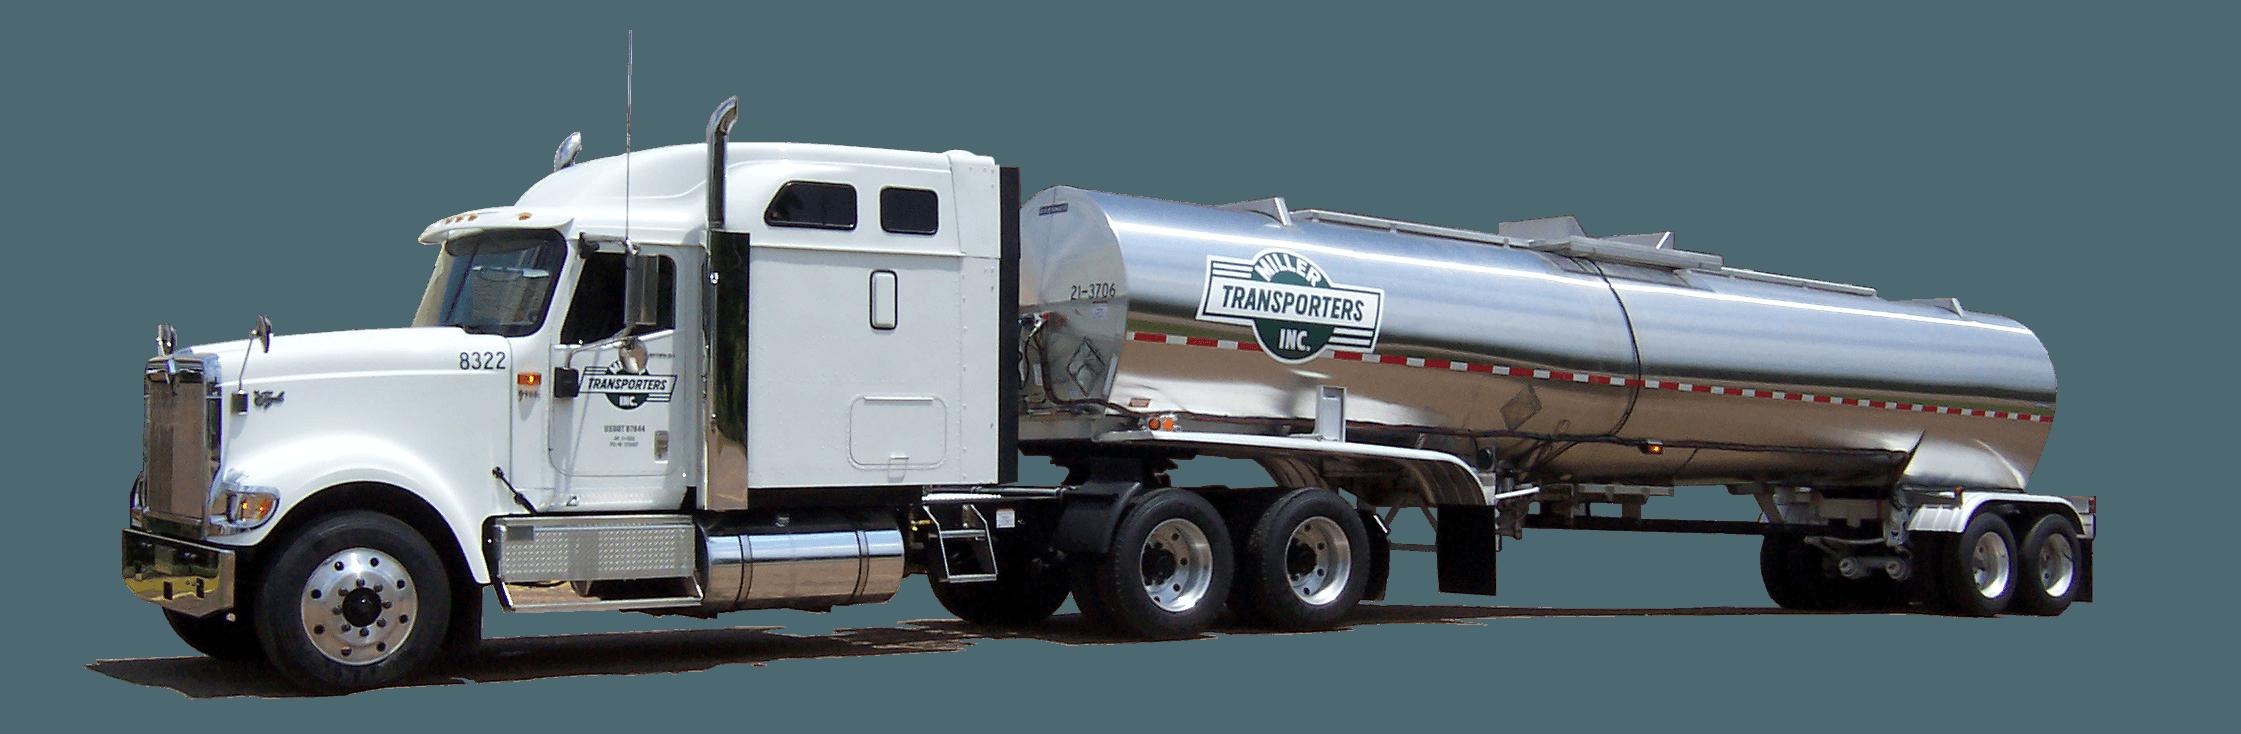 Miller Transporters, Heniff Transportation Joining Forces